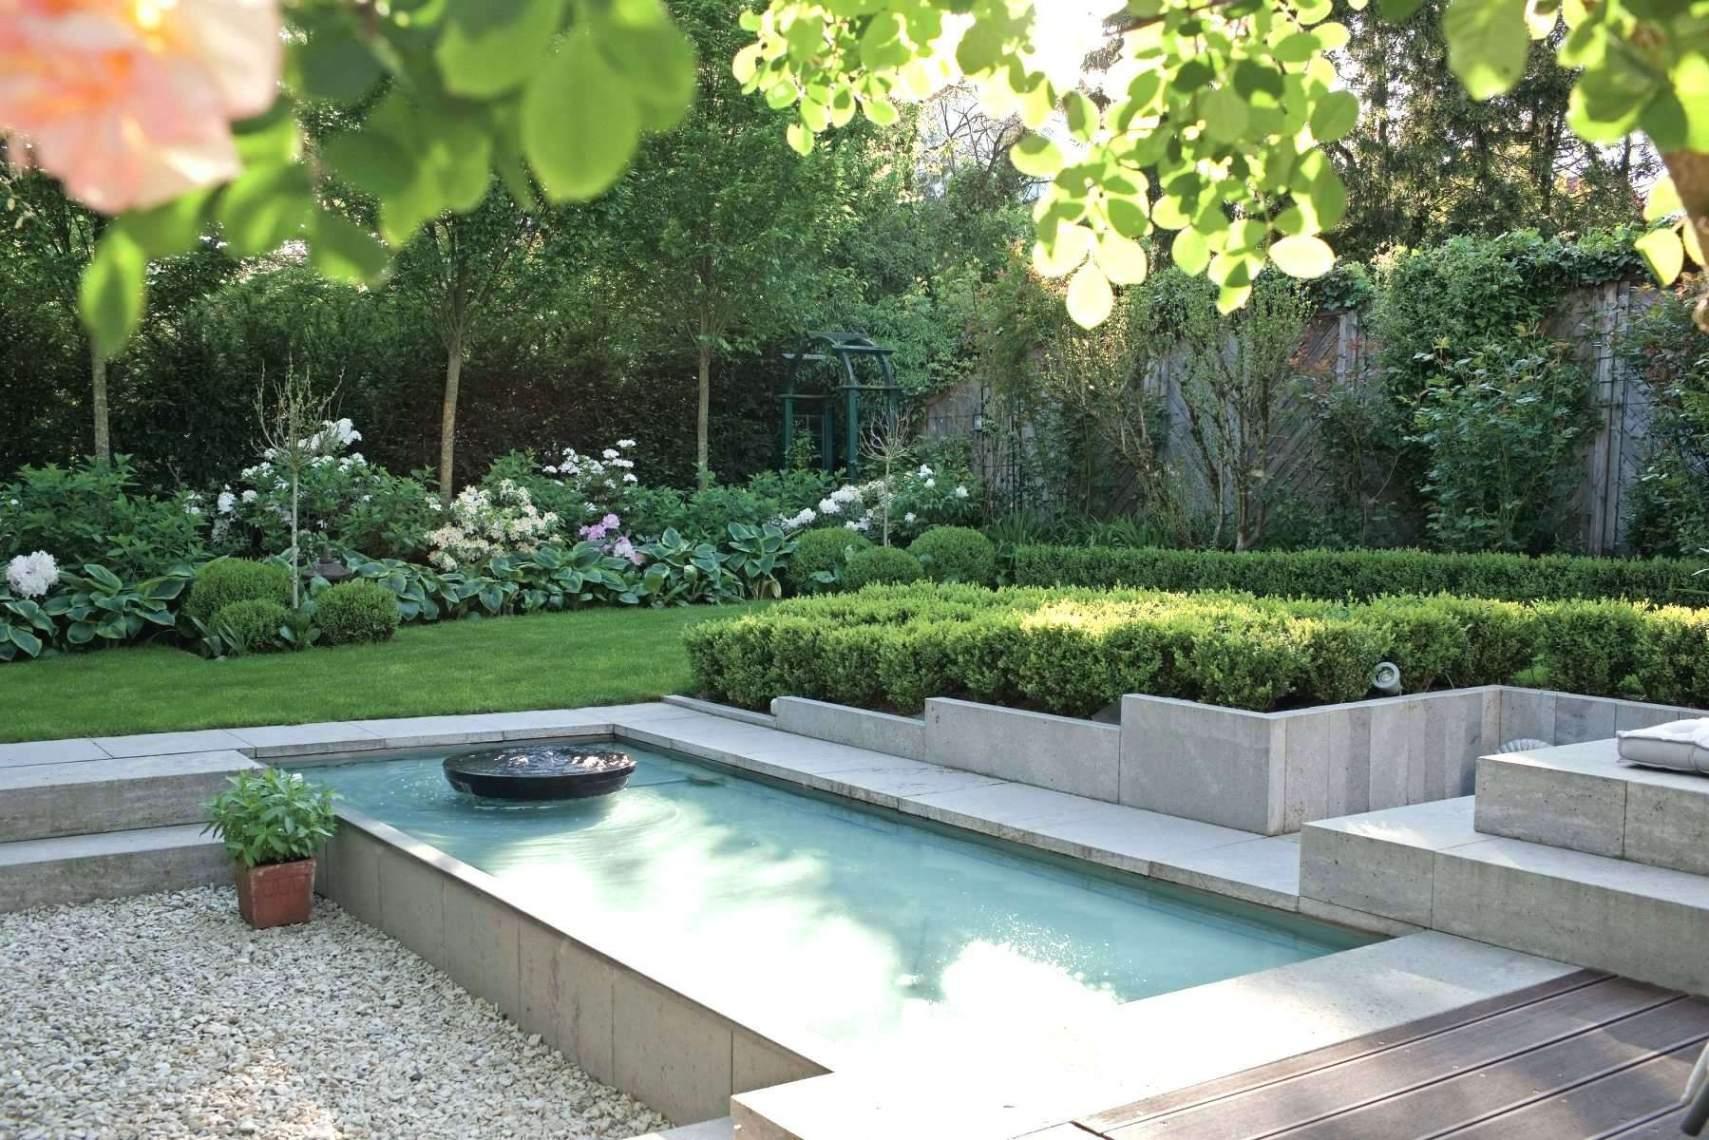 formaler reihenhausgarten 0d design ideen von garten gestalten ideen kleiner reihenhausgarten gestalten kleiner reihenhausgarten gestalten